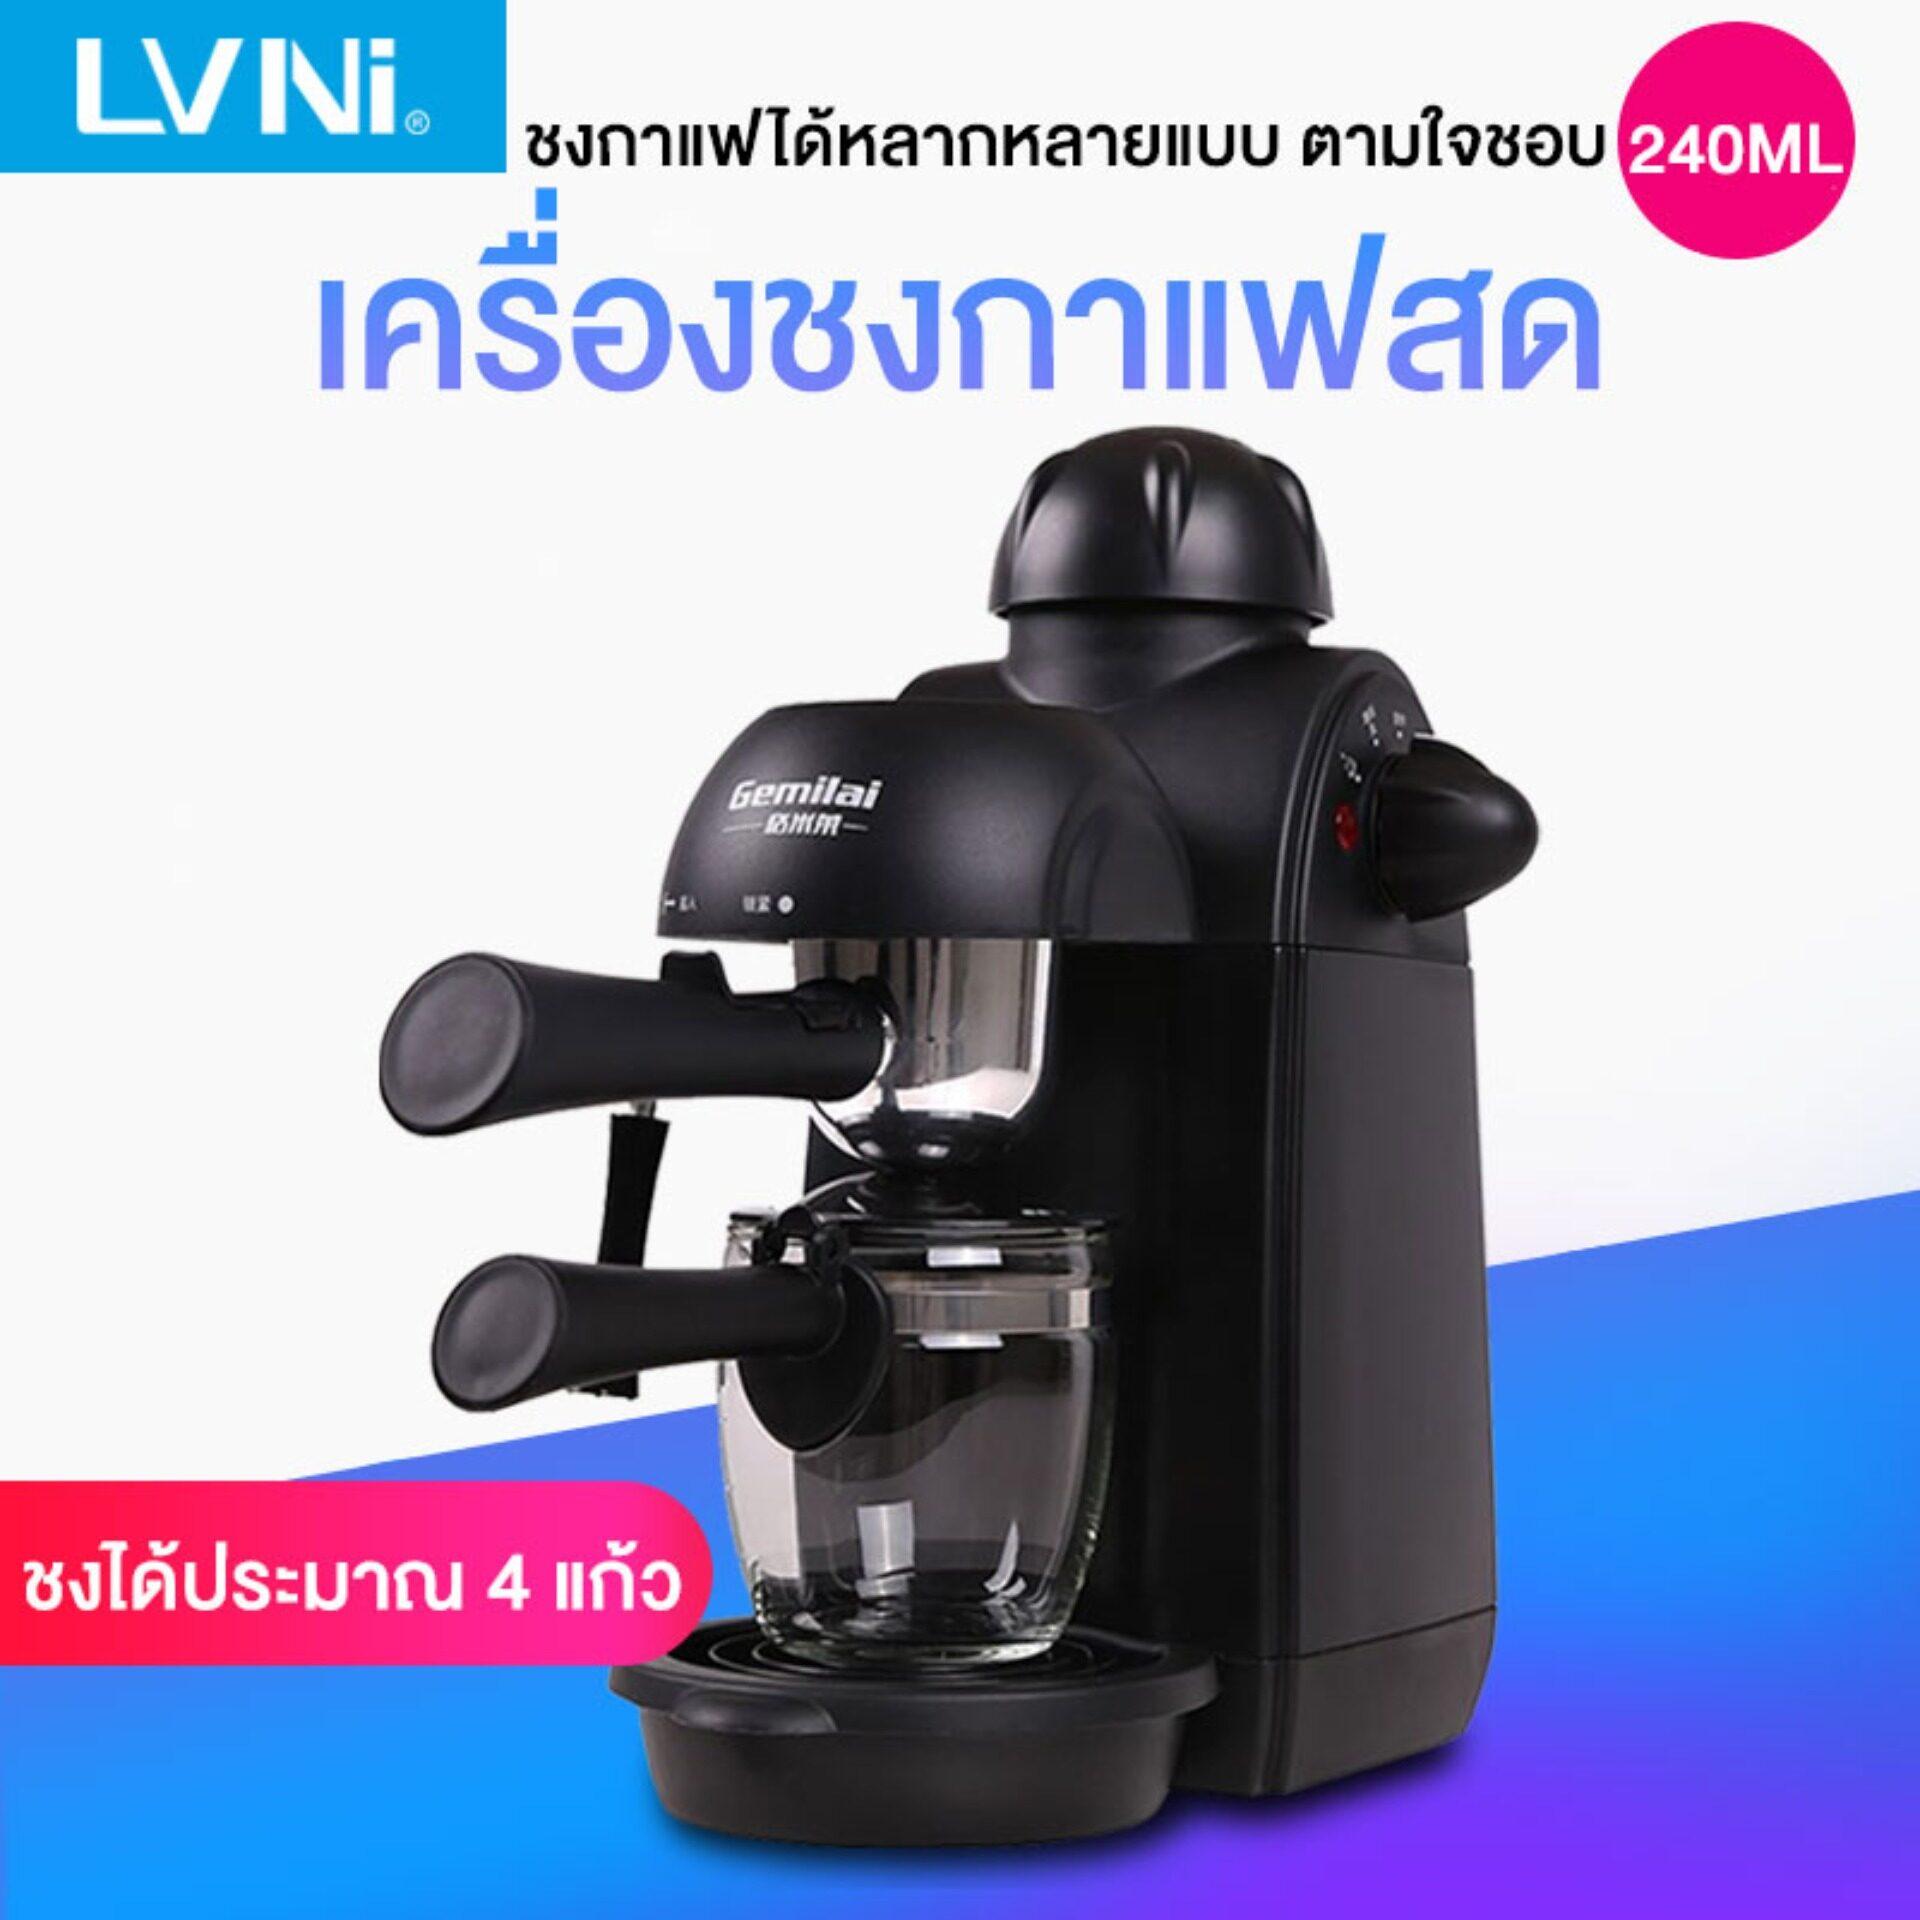 Lvni เครื่องชงกาแฟสด แบบก้านโยก Fresh Coffee Maker รุ่น Crm2008.